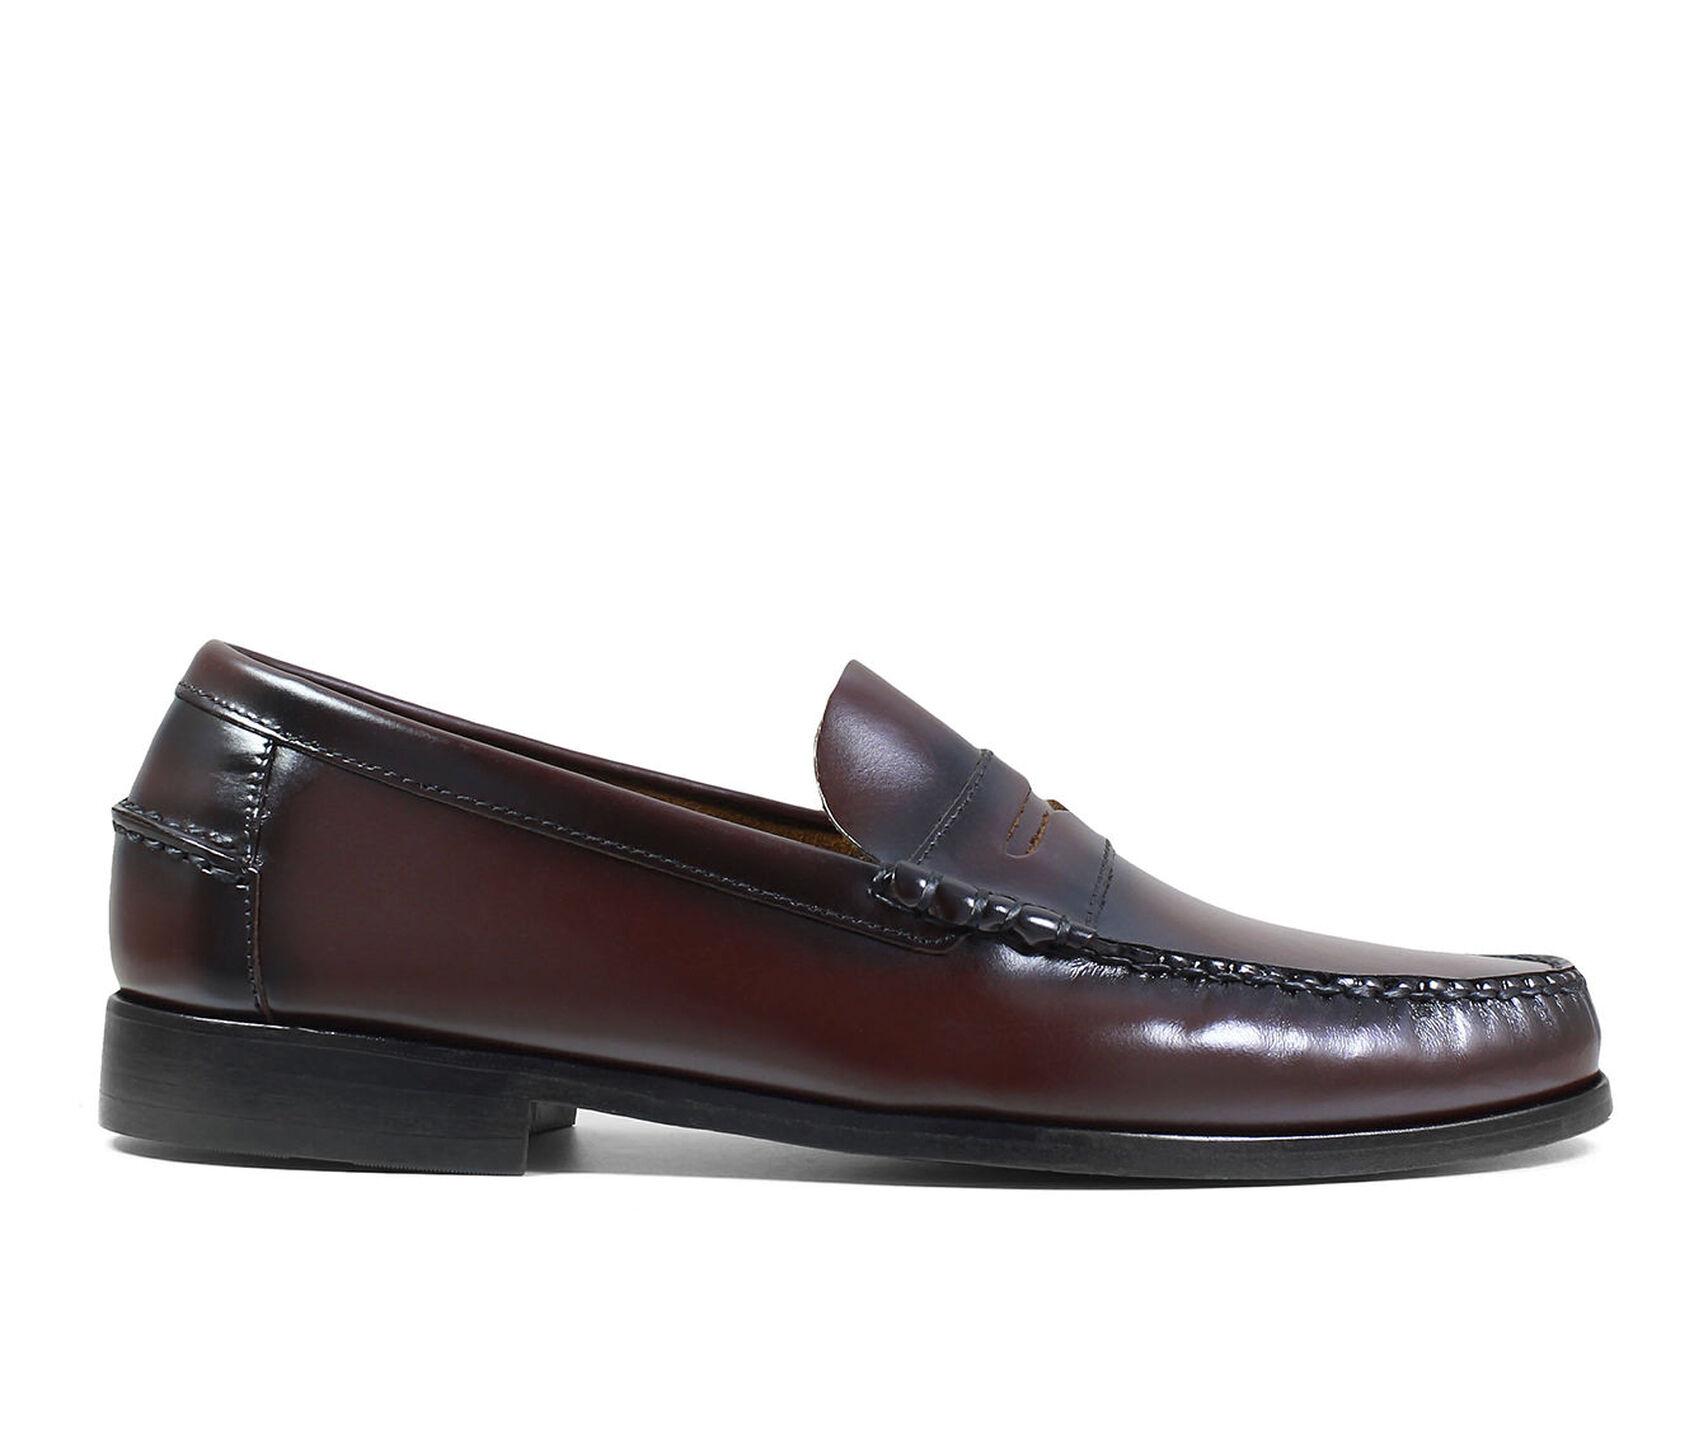 e86c4bc00 Men S Florsheim Berkley Penny Loafer Dress Shoes Shoe Carnival